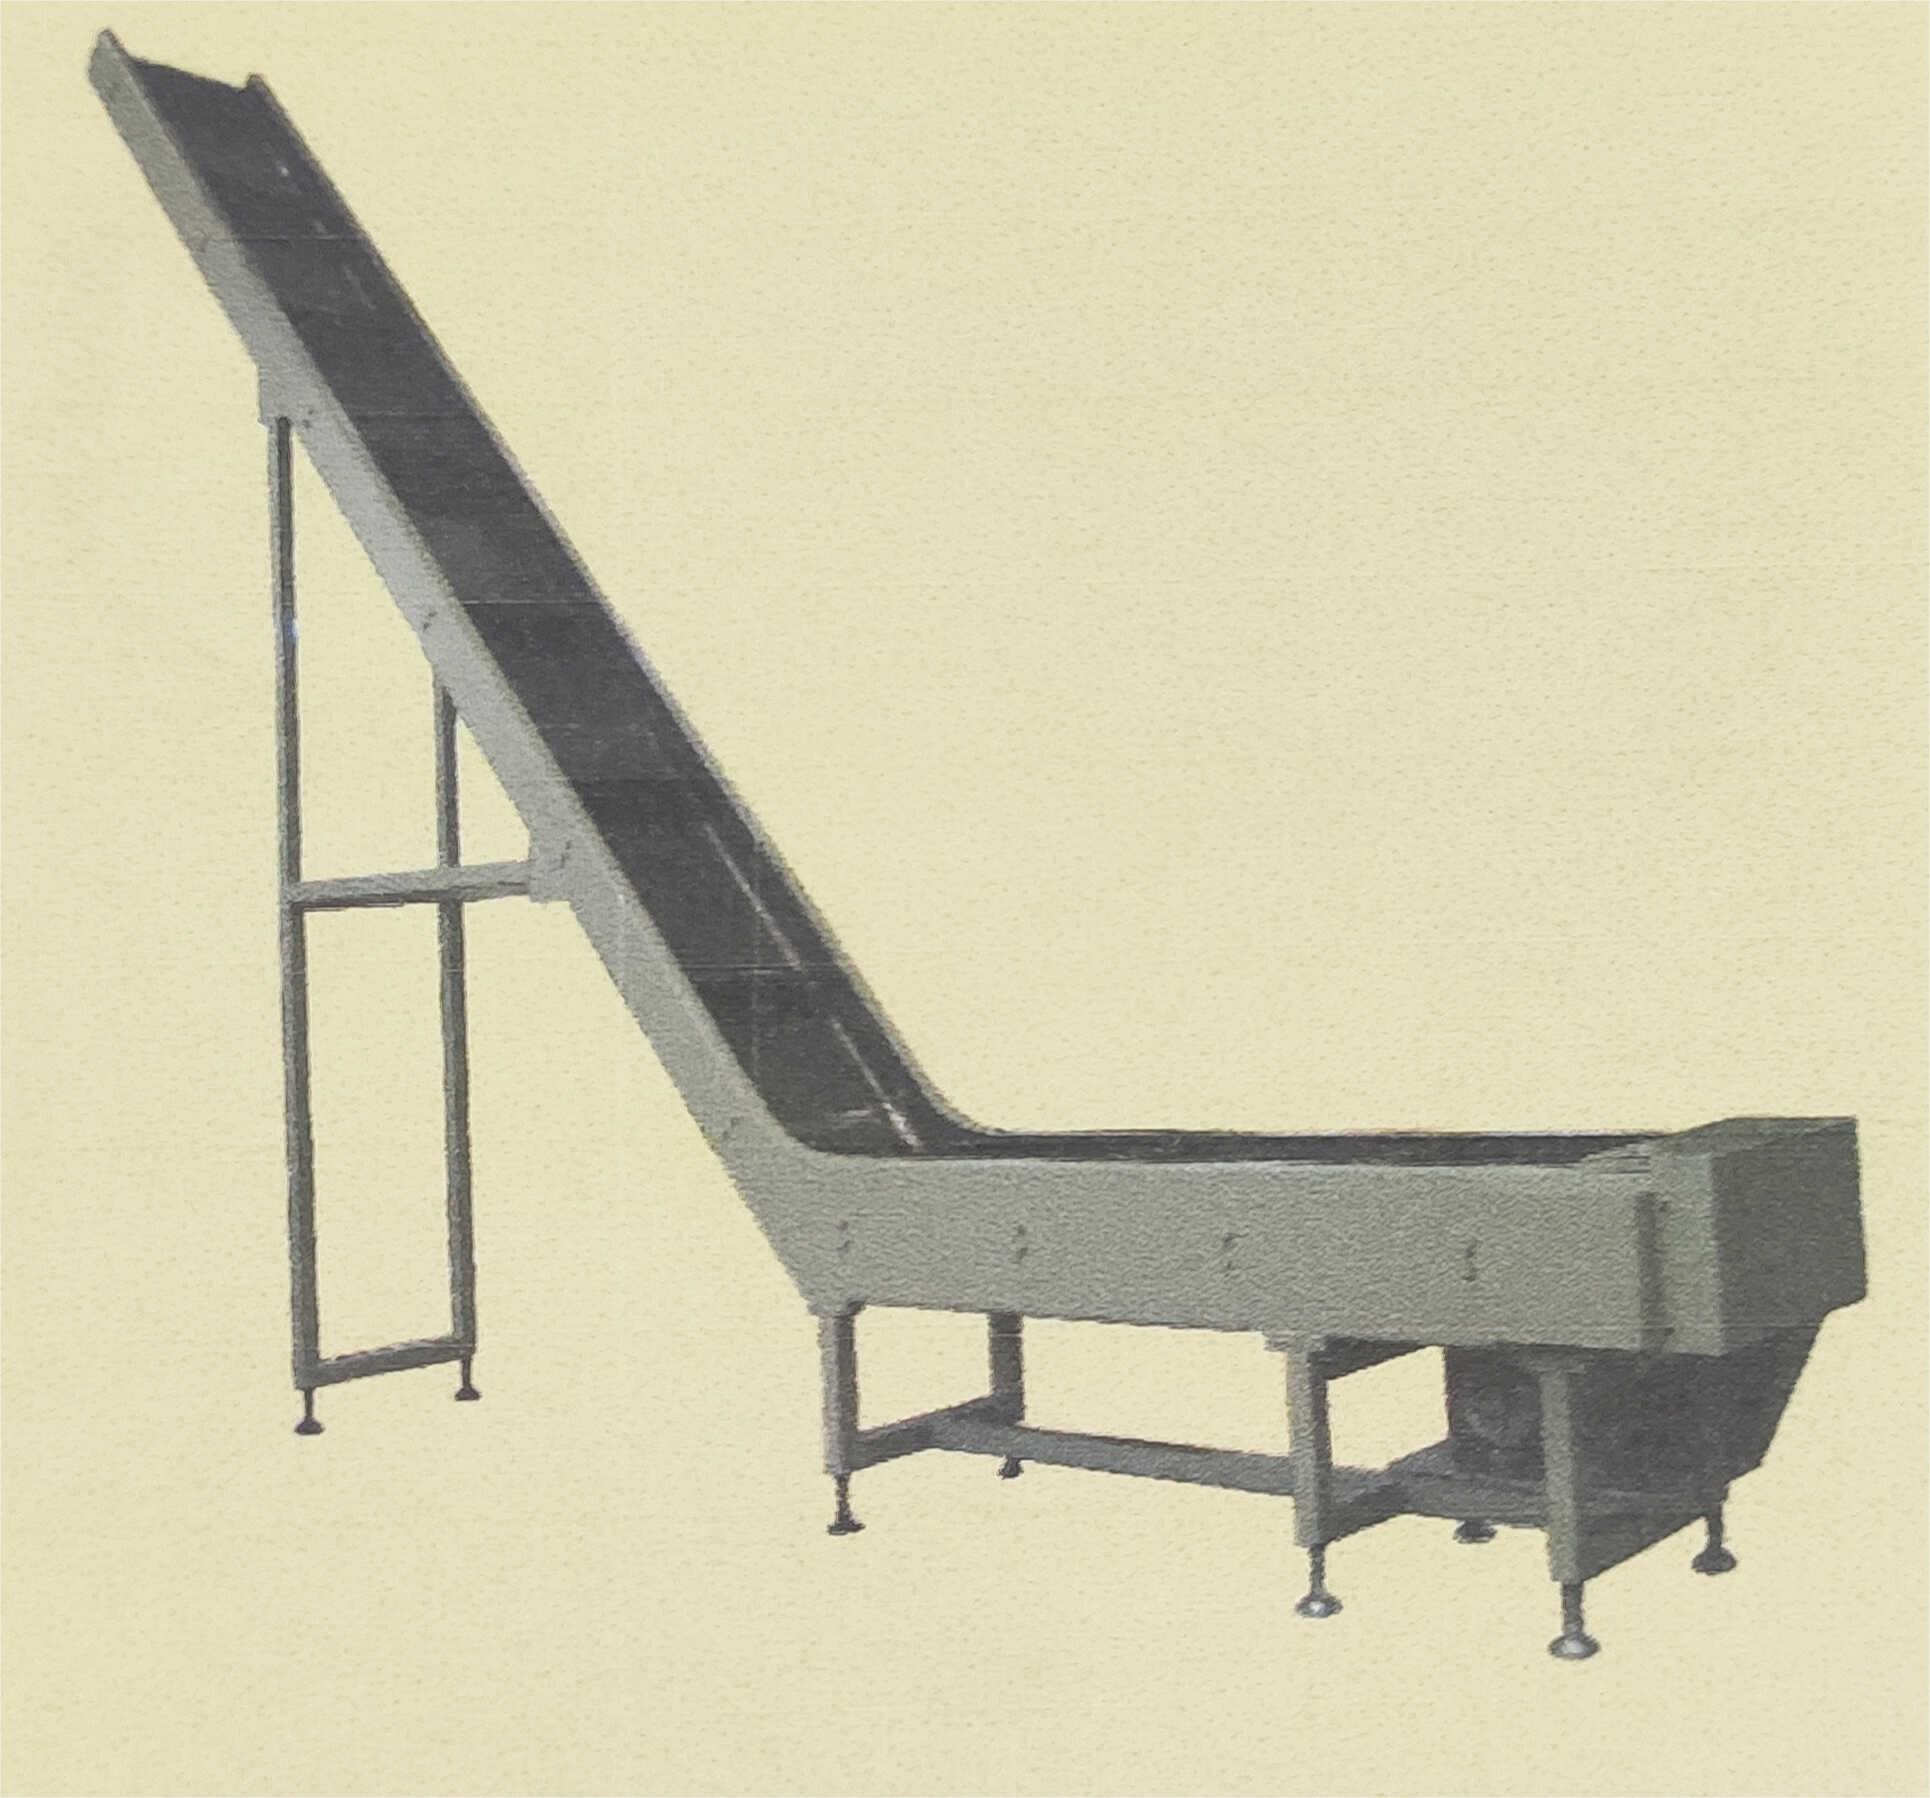 Scrap Carry Slope Conveyor